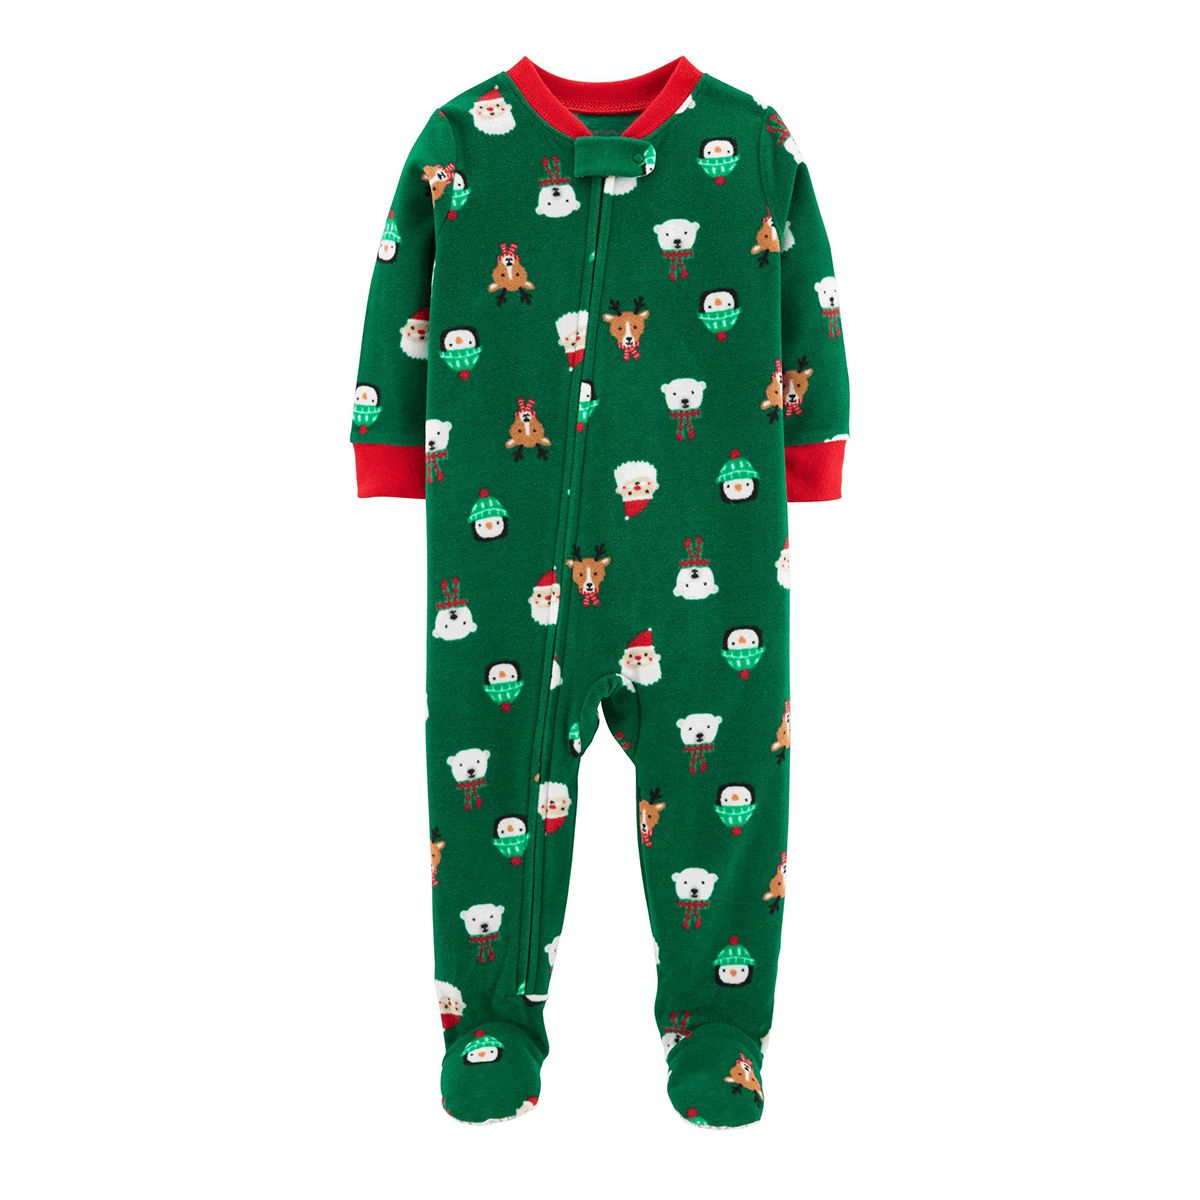 bbaf0022a0 Pajamas Carter s Baby Clothes - Macy s